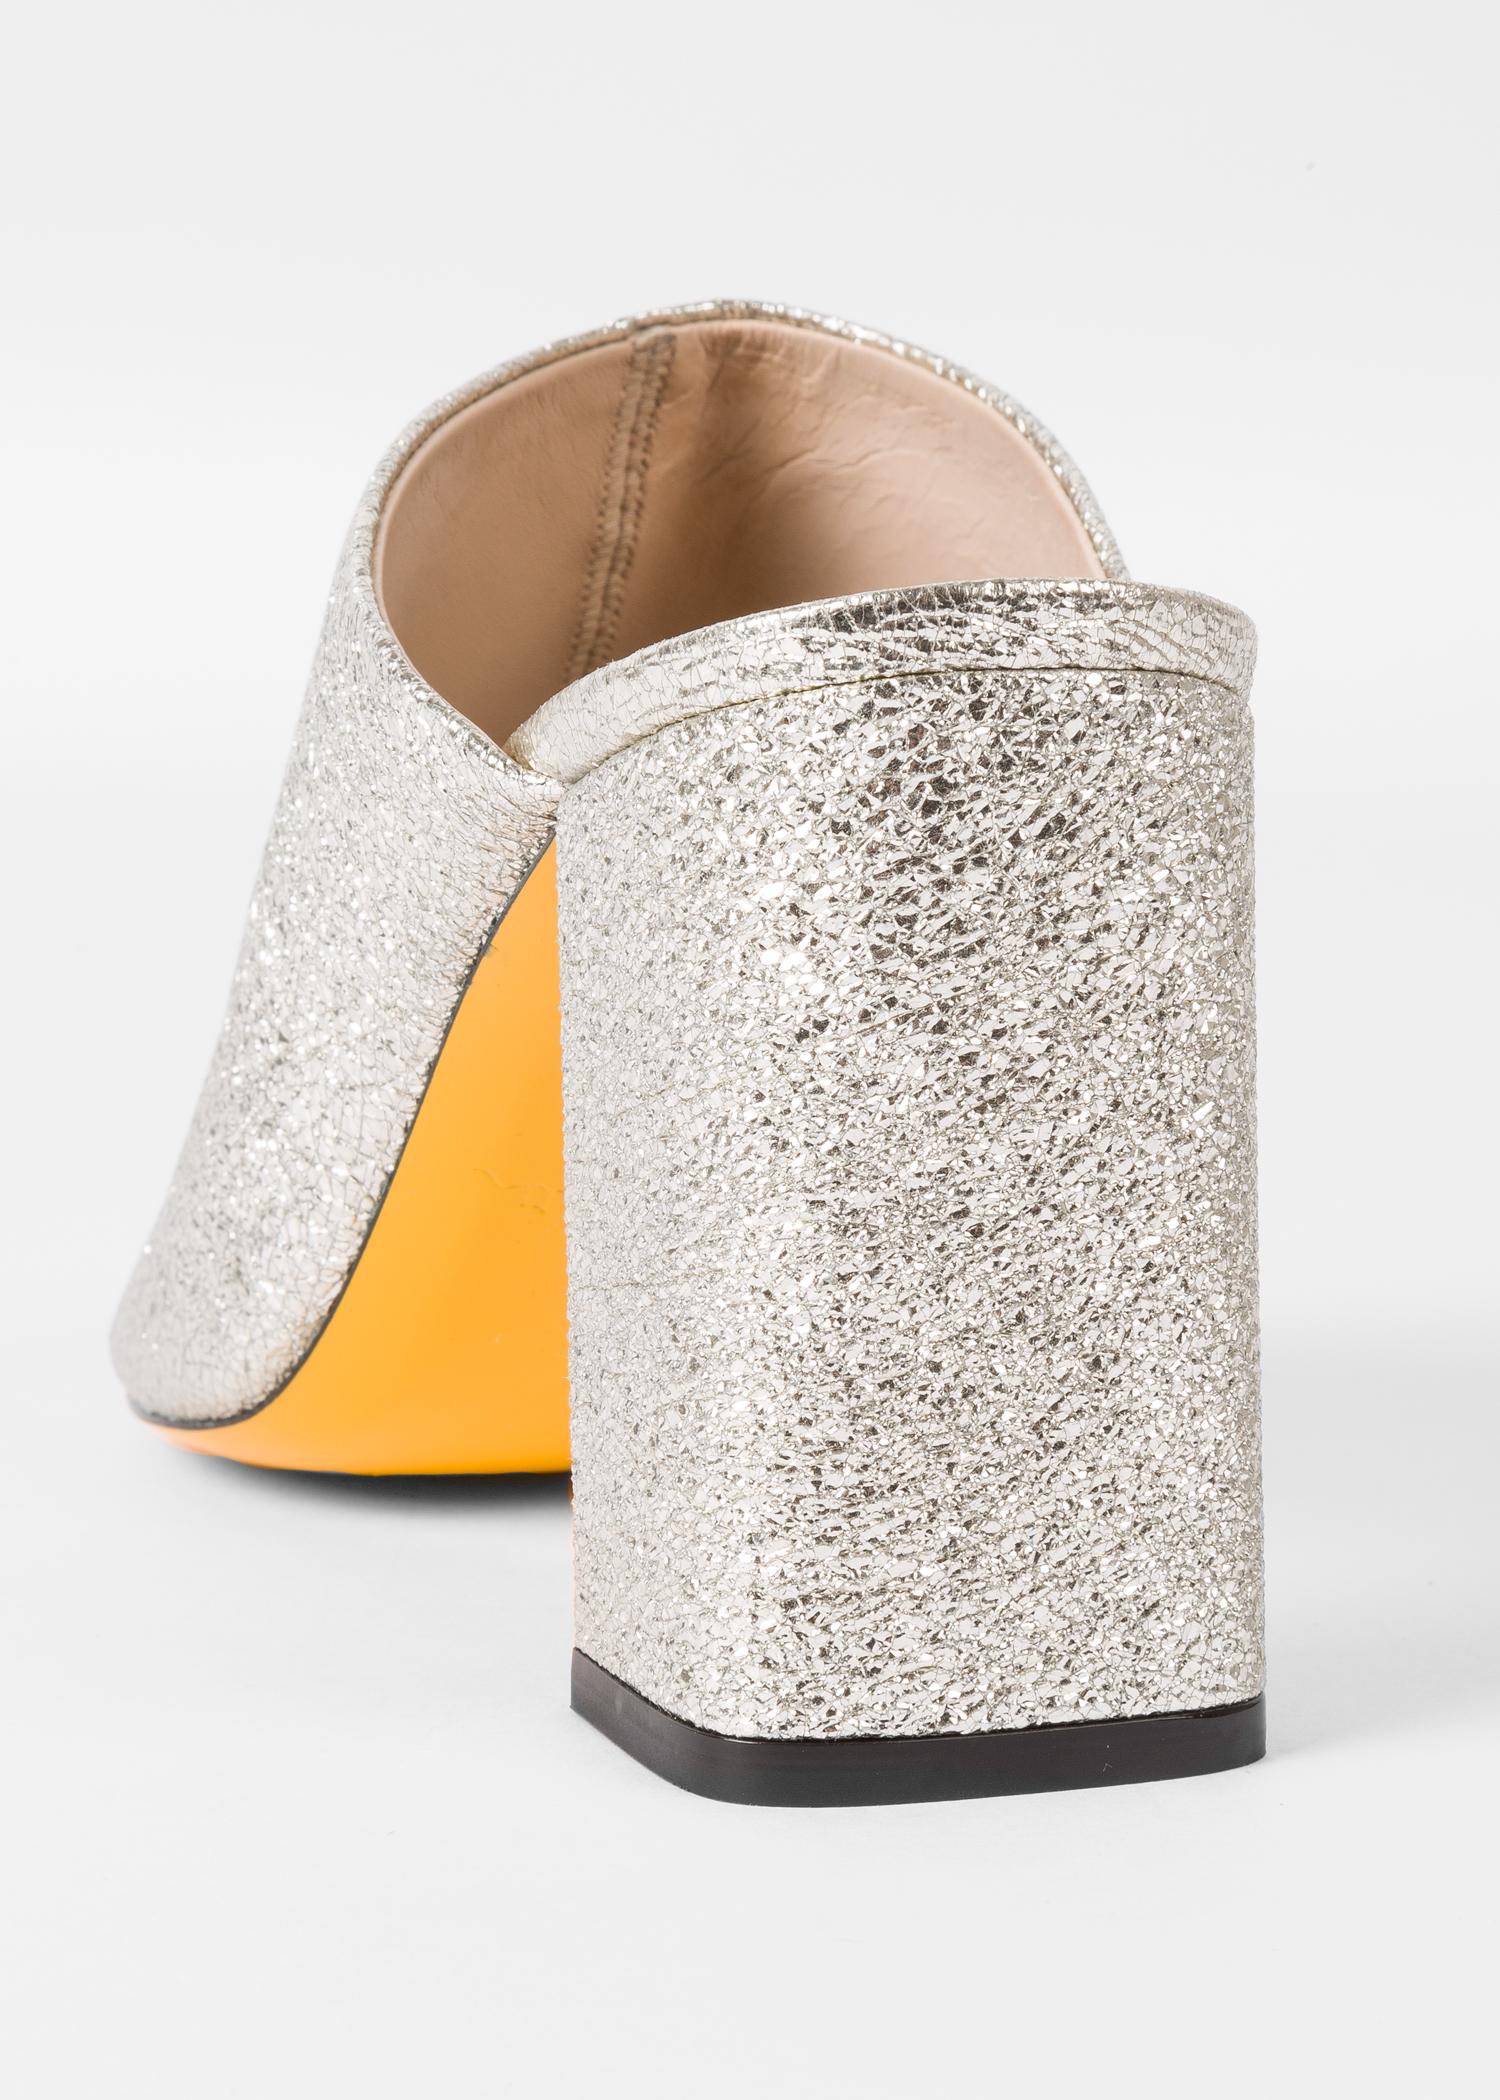 98e74ebbc484 Heel view - Women's Silver Glitter Heeled Mules Paul Smith